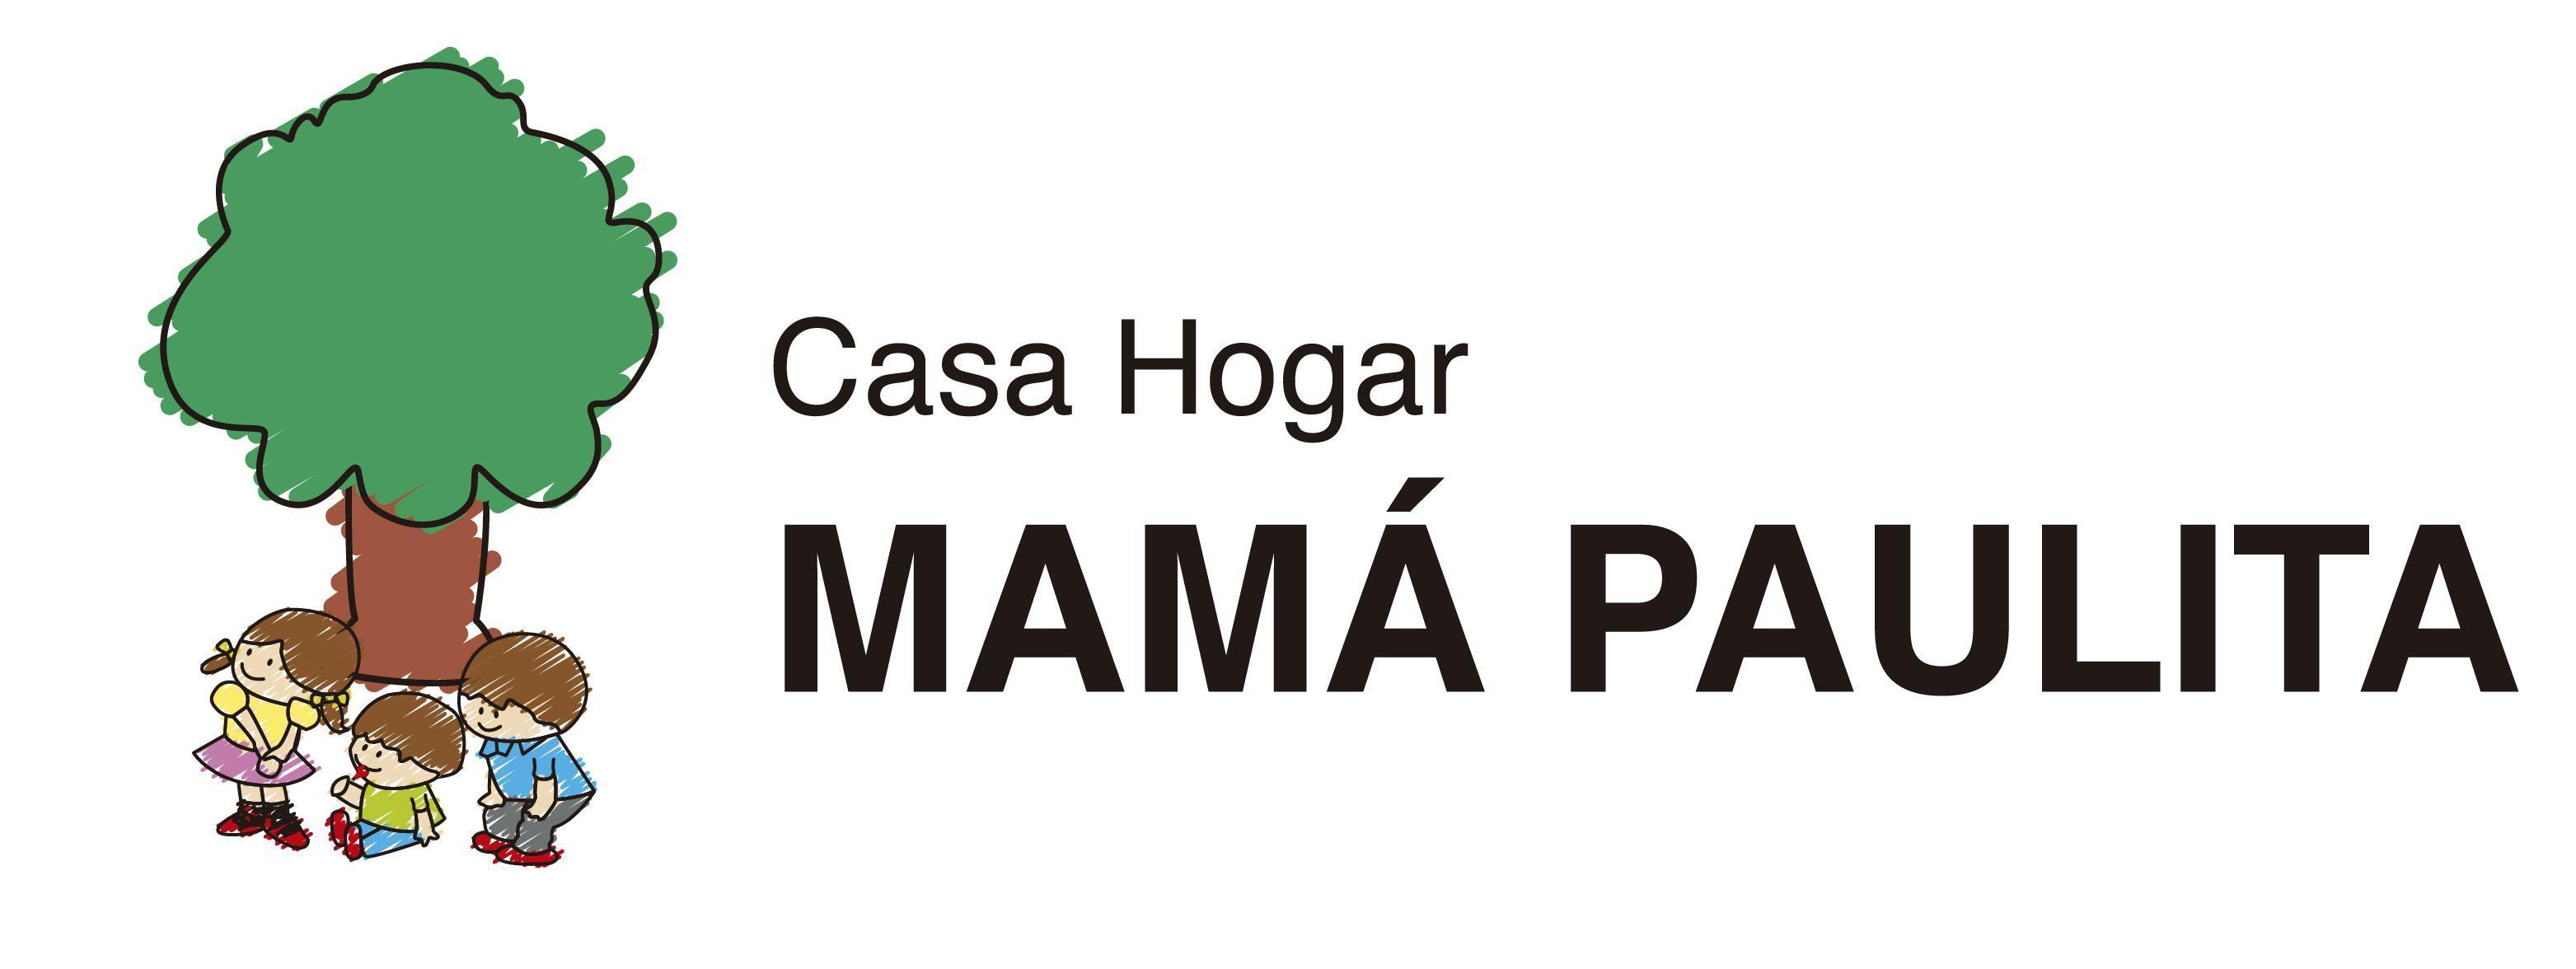 CASA HOGAR MAMÁ PAULITA